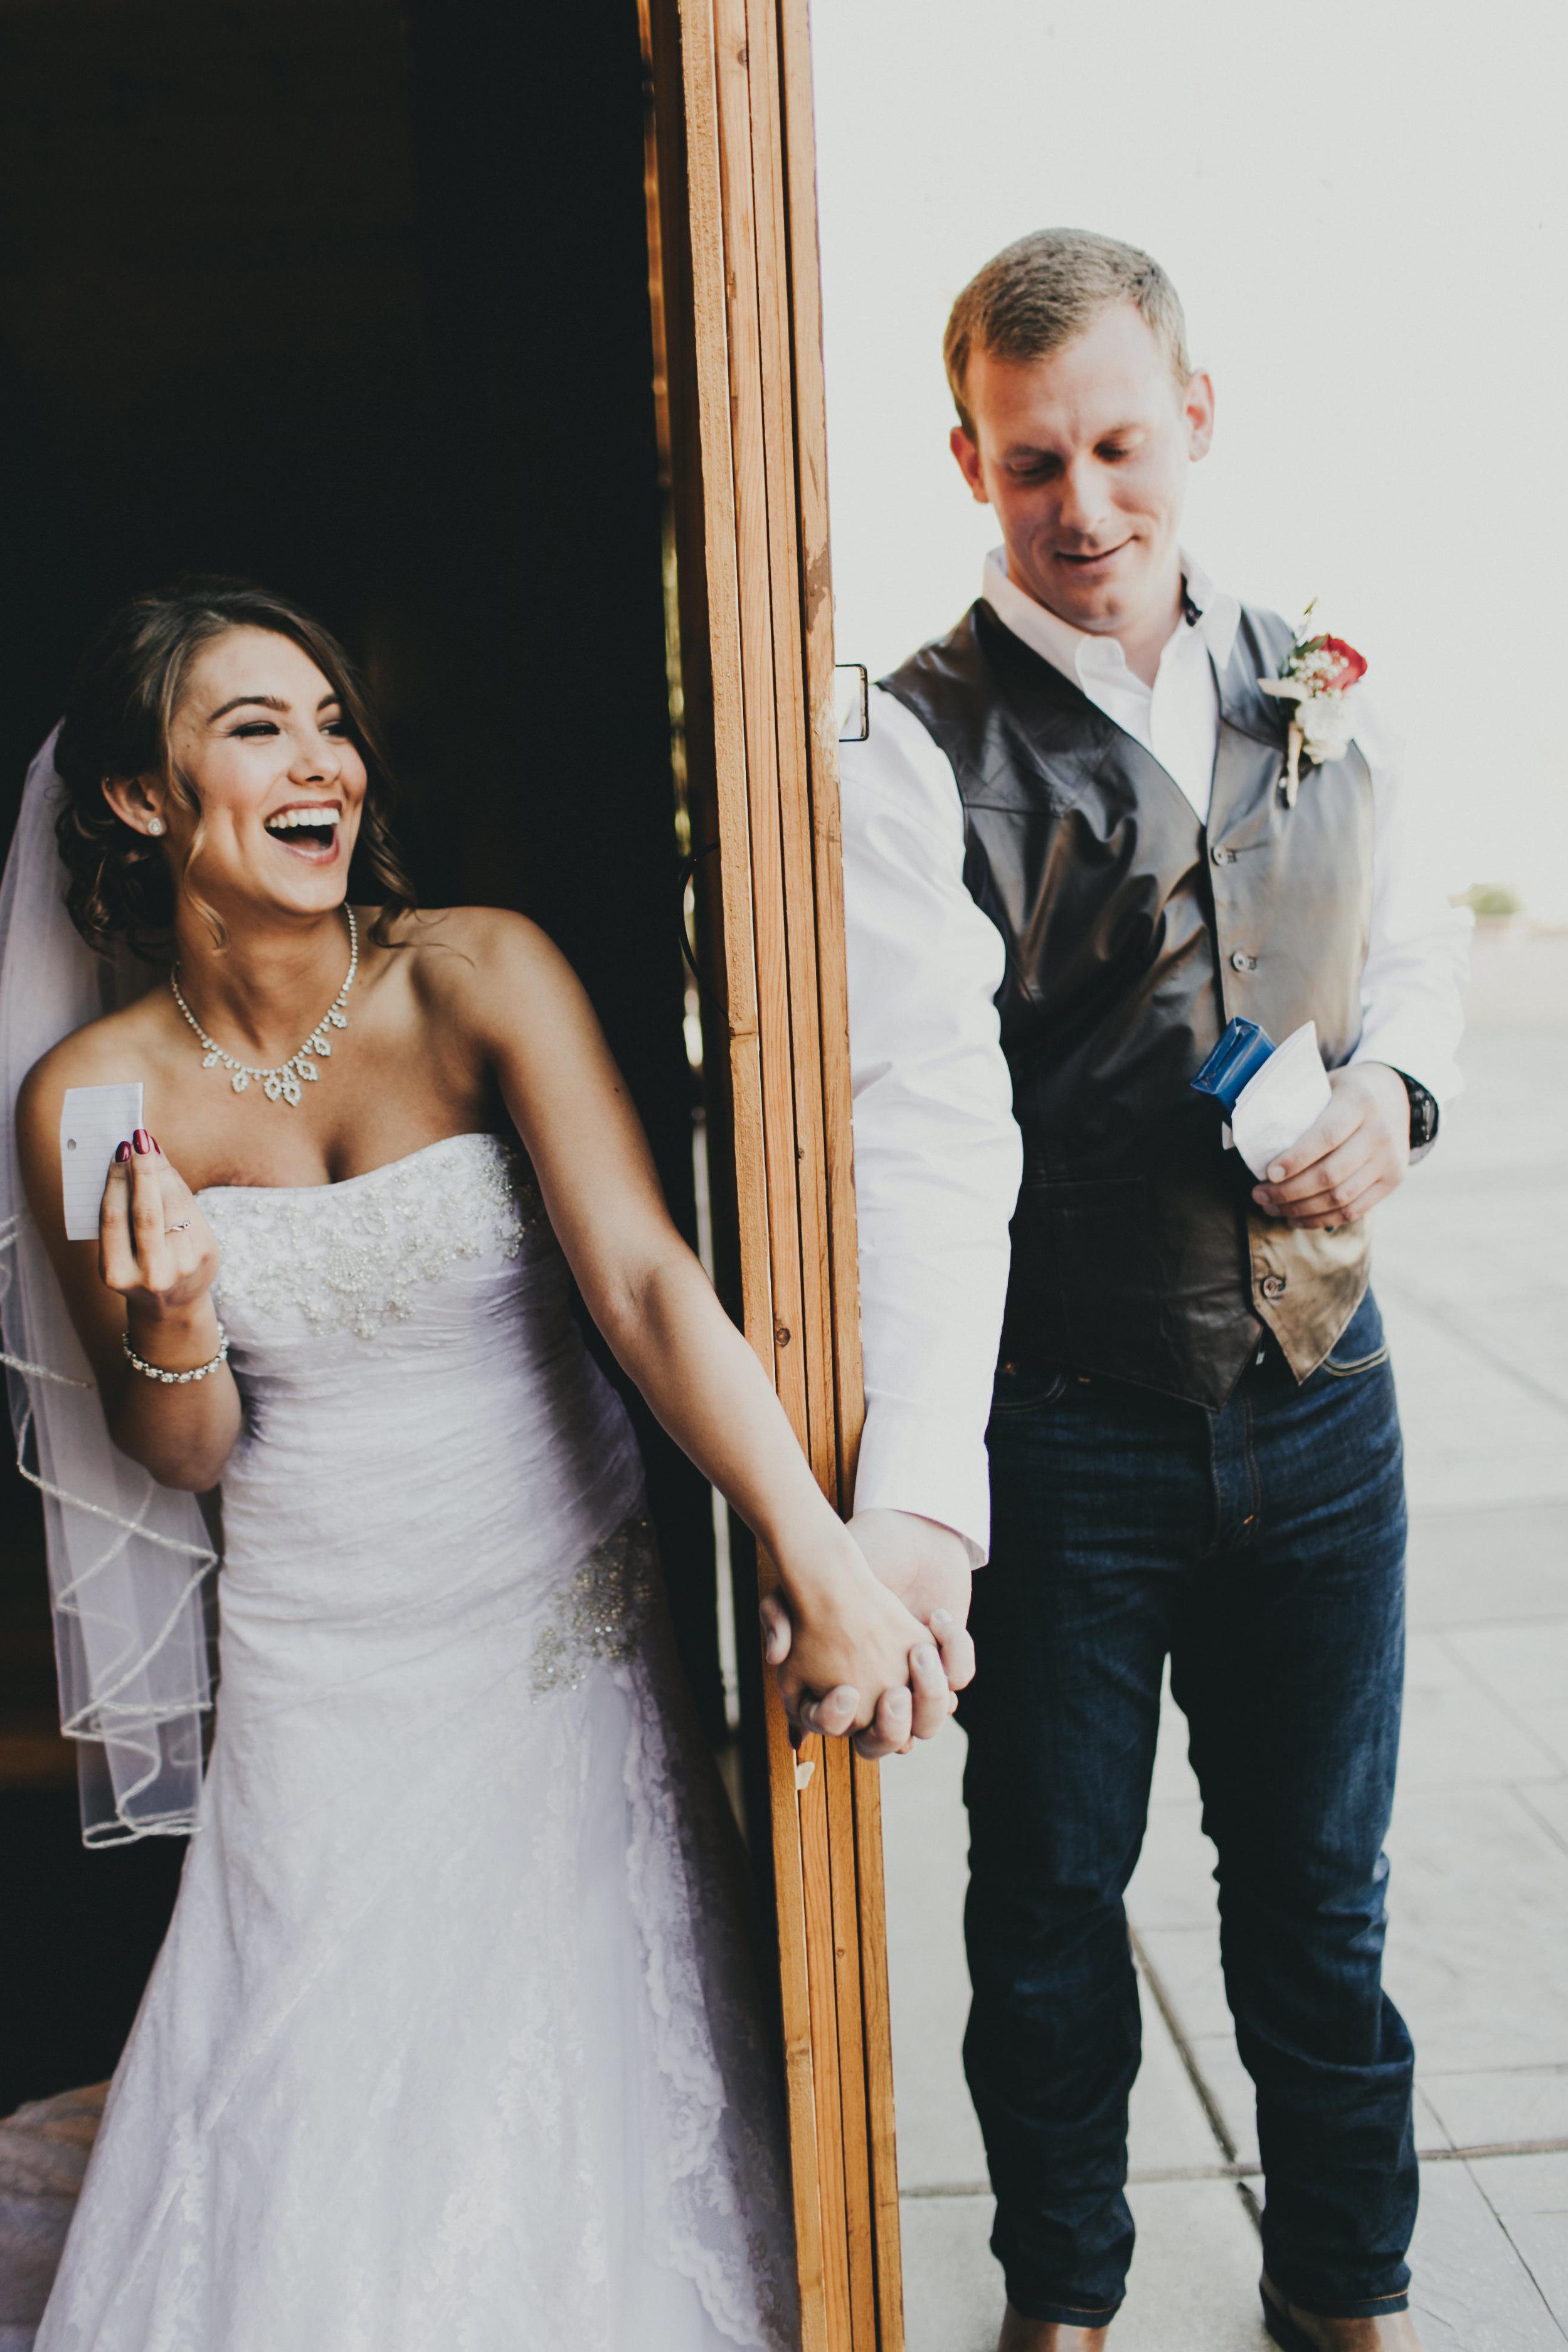 Cheyenne + Jordan - Wedding, Natalie Griffo (33 of 157).jpg